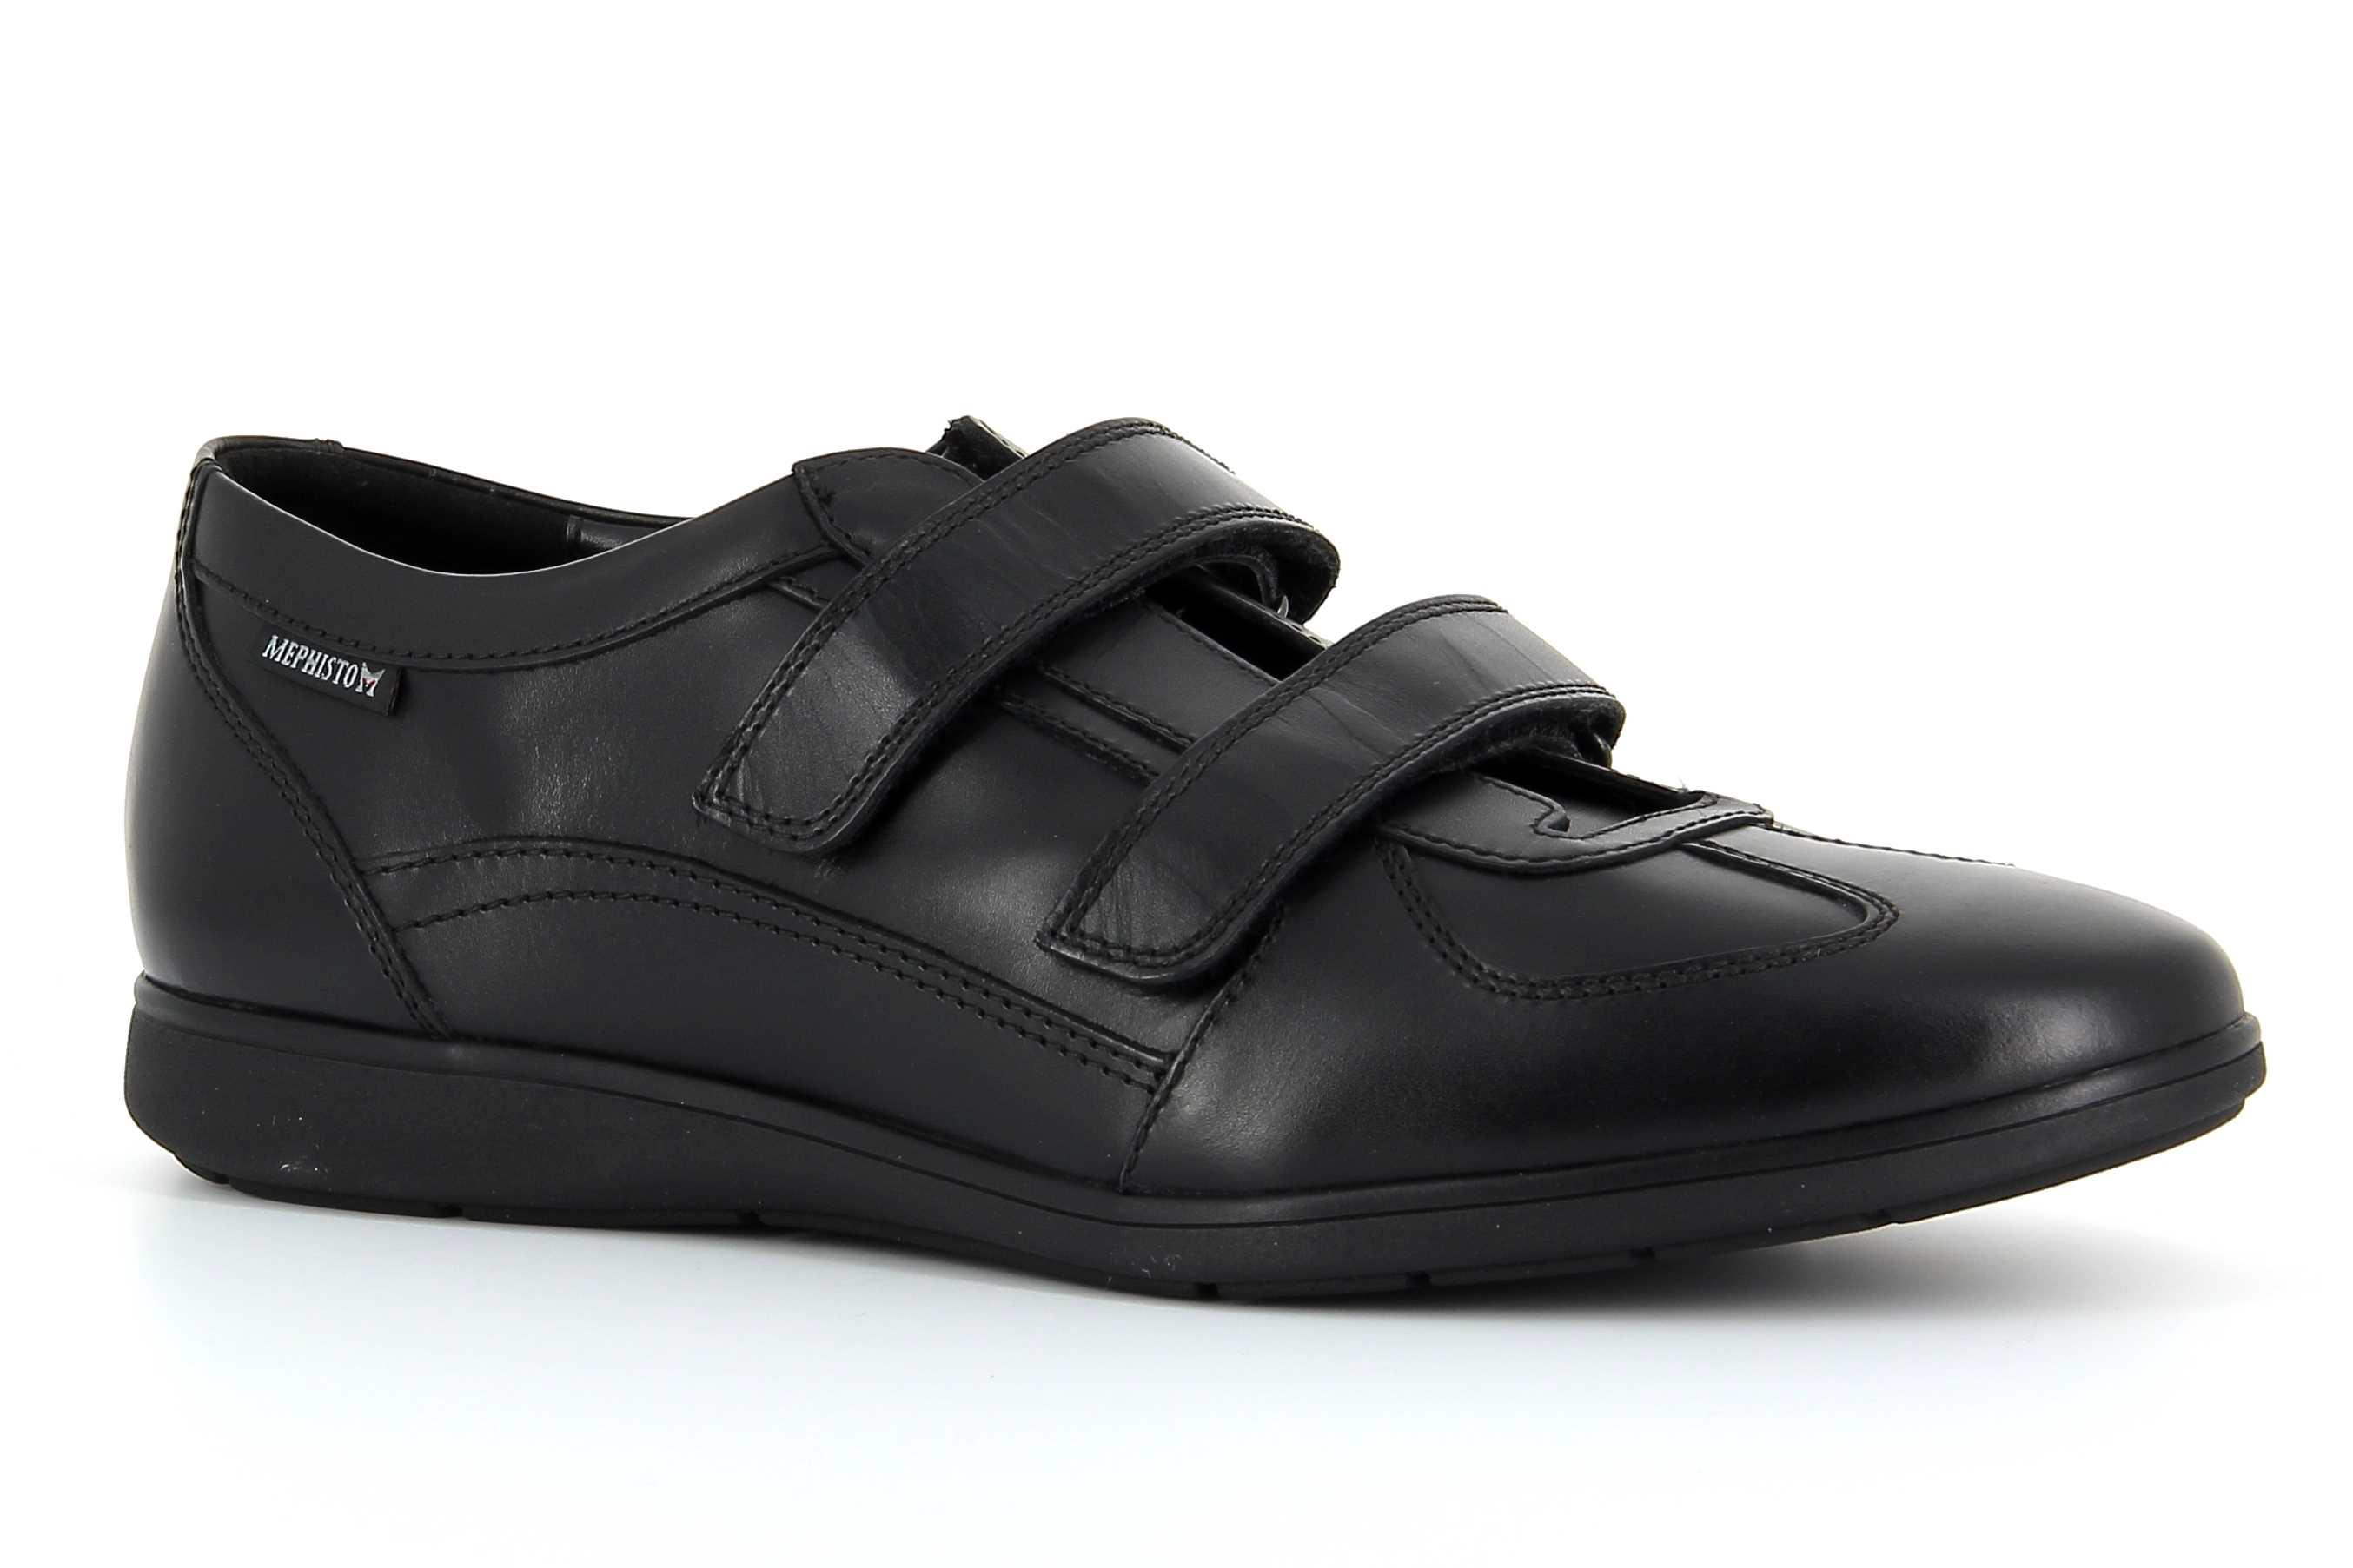 c3c404bc50461 Mephisto-Shop chaussures confortables velcro homme - modèle LUCIANO ...